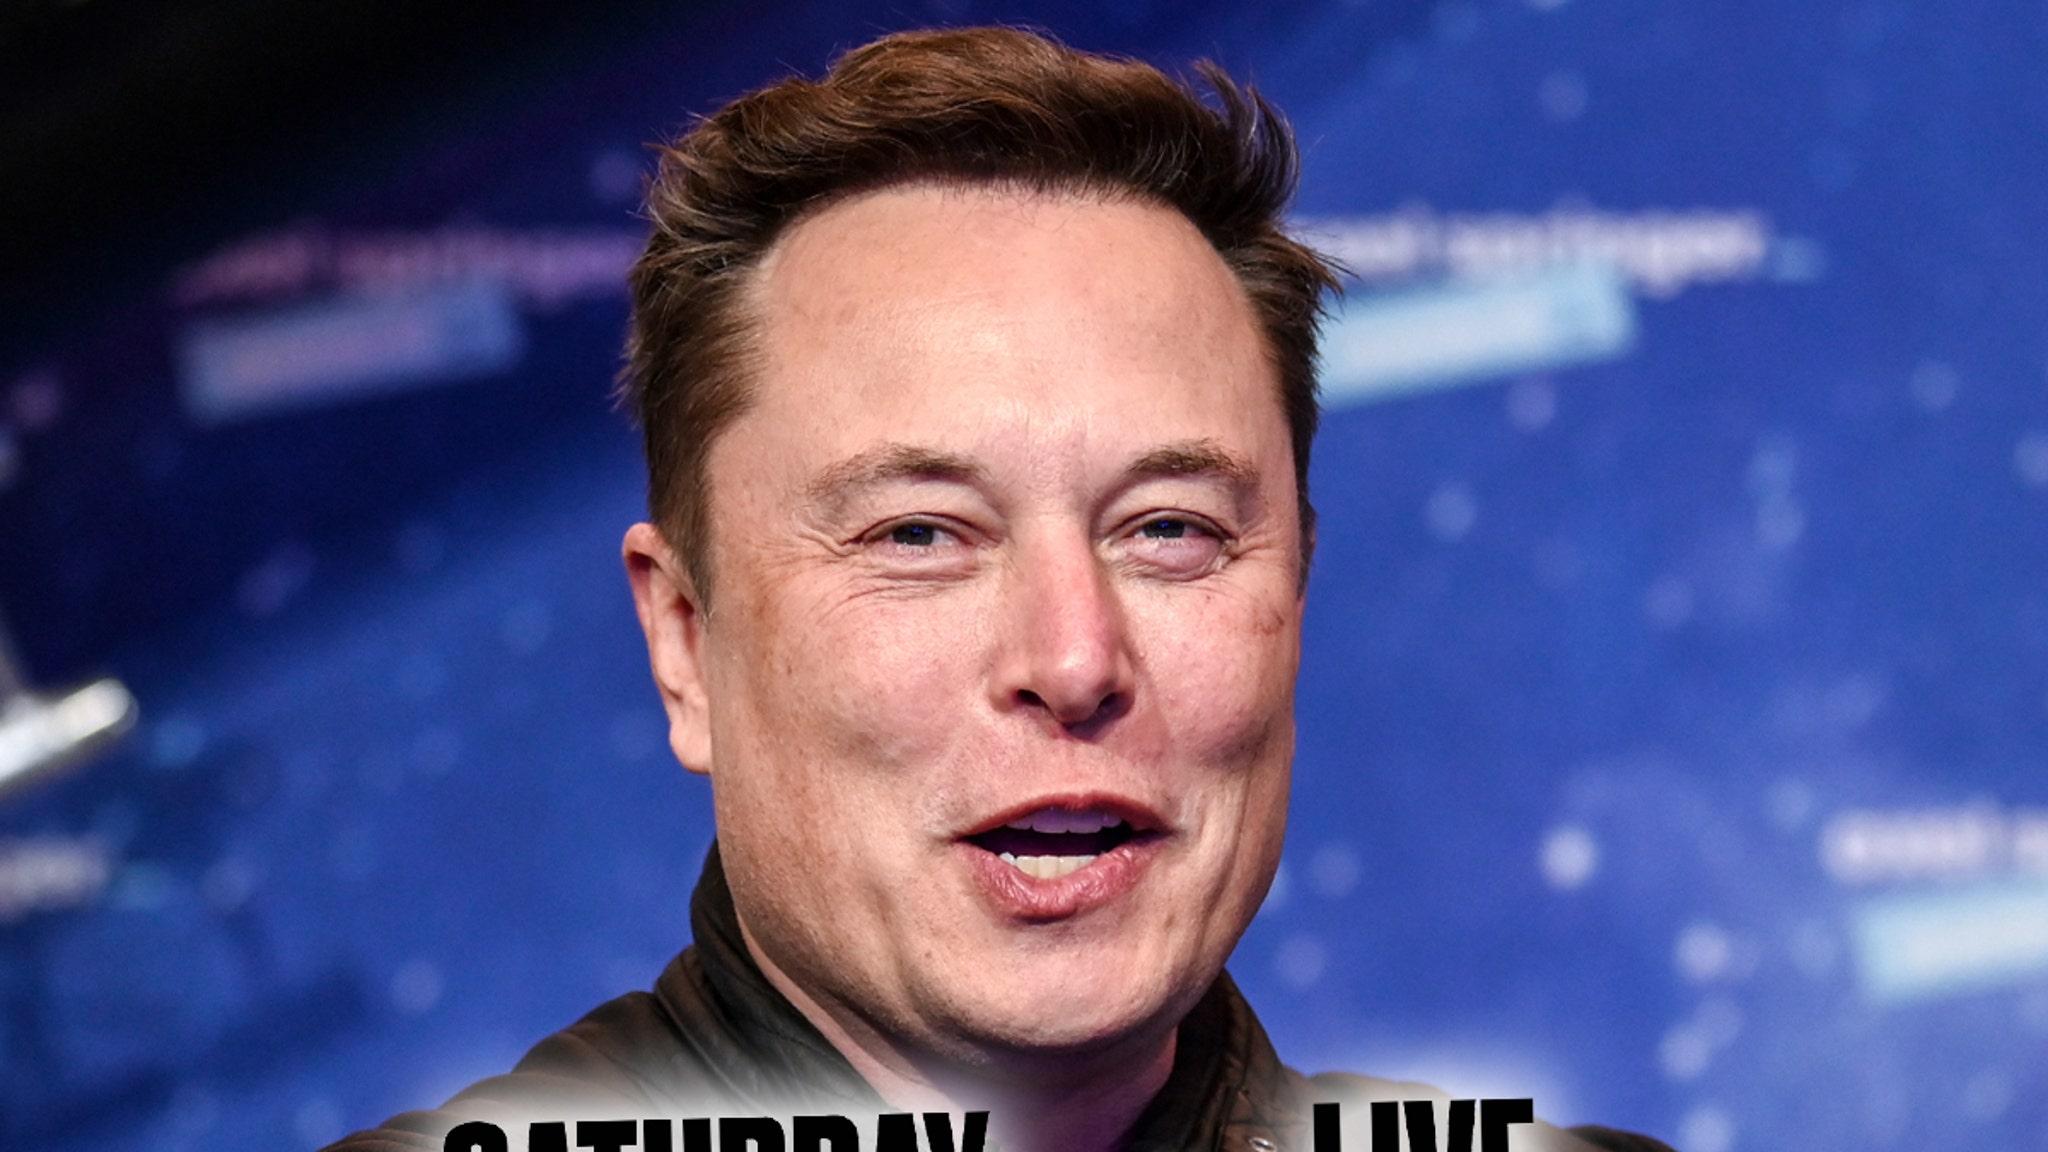 Elon Musk Confirmed to Be Hosting 'SNL' Alongside Miley Cyrus thumbnail